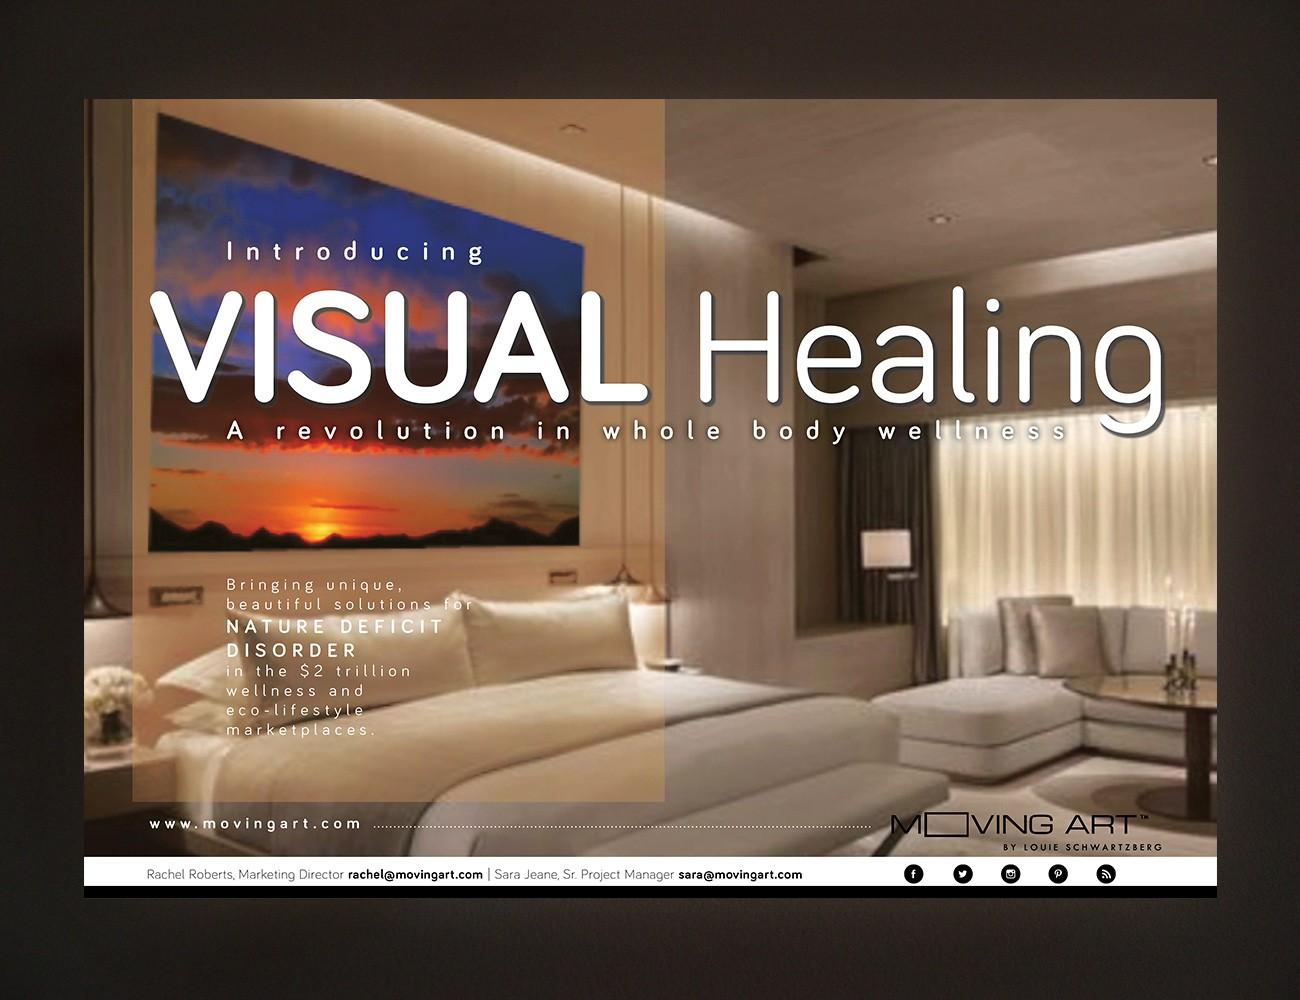 Visually Stunning and Bold Brand Presentation for Filmmaker Studio